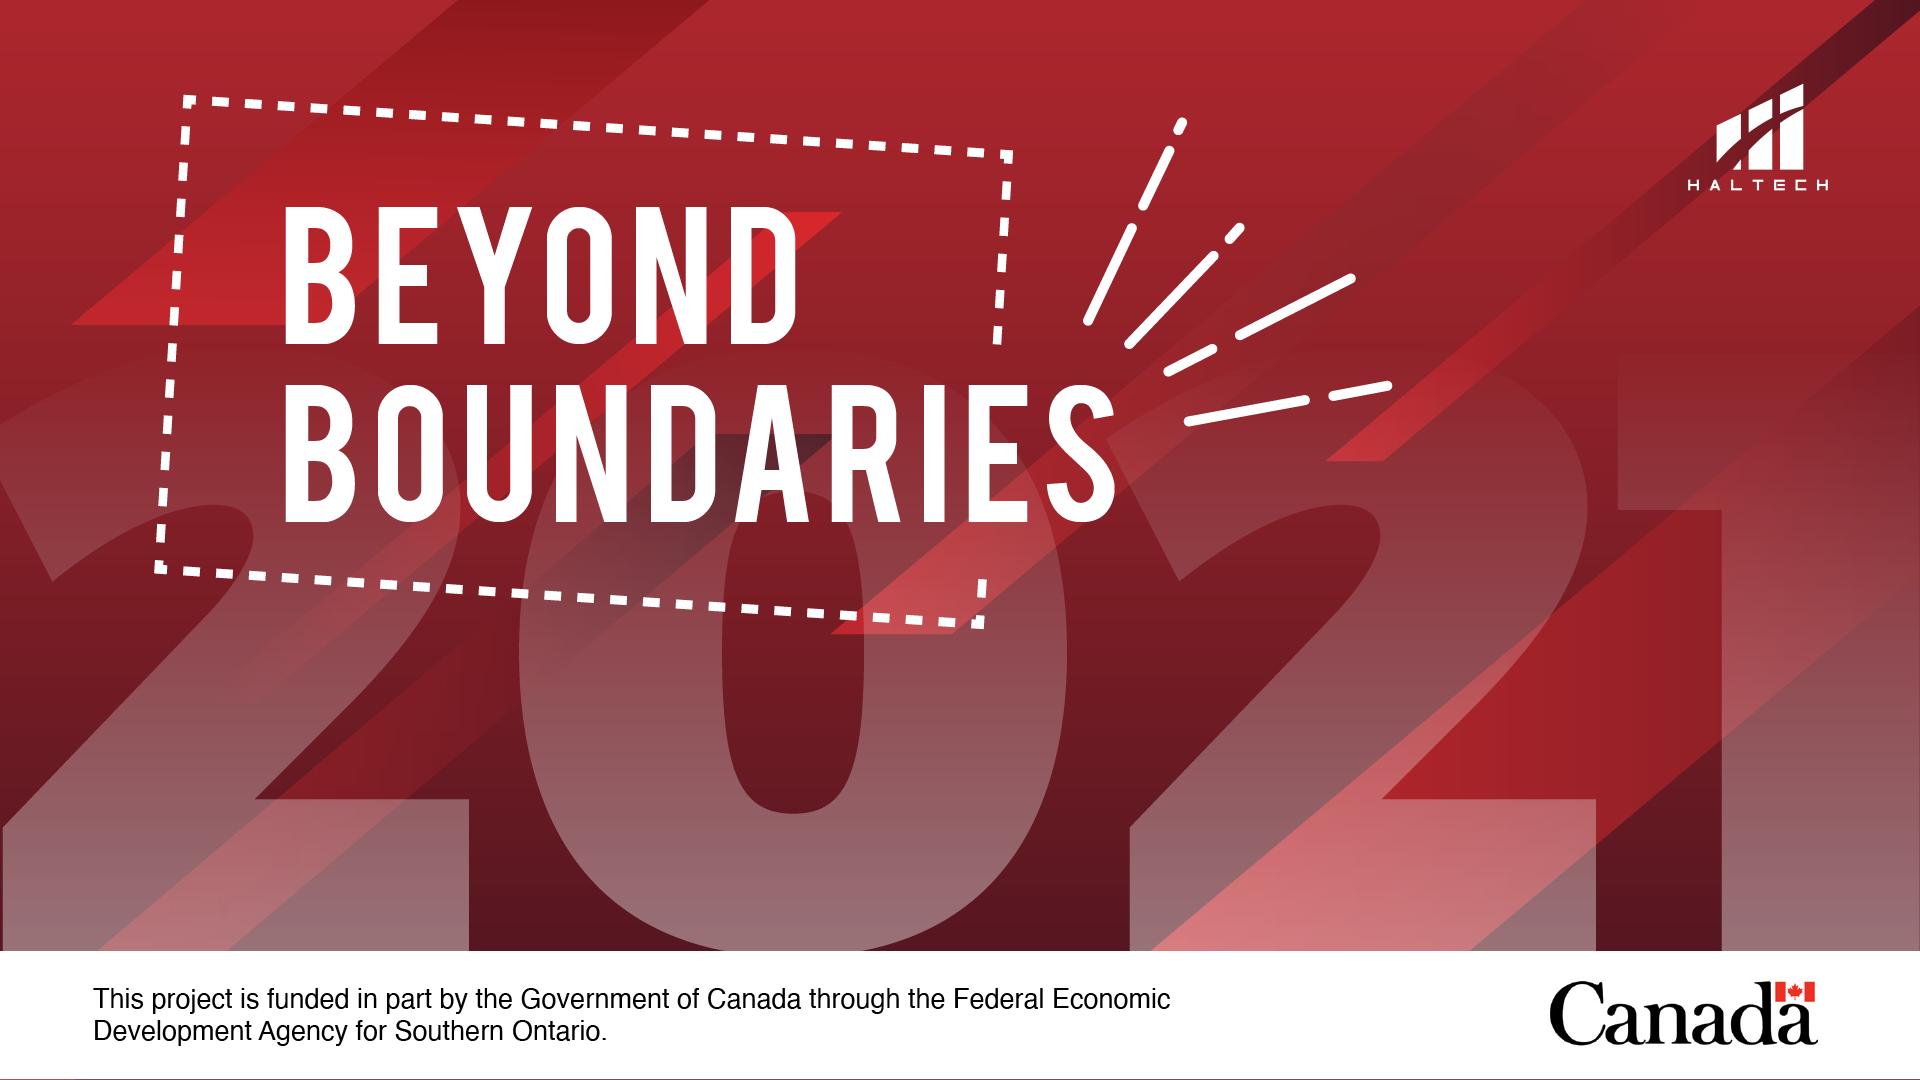 Beyond Boundaries Visual